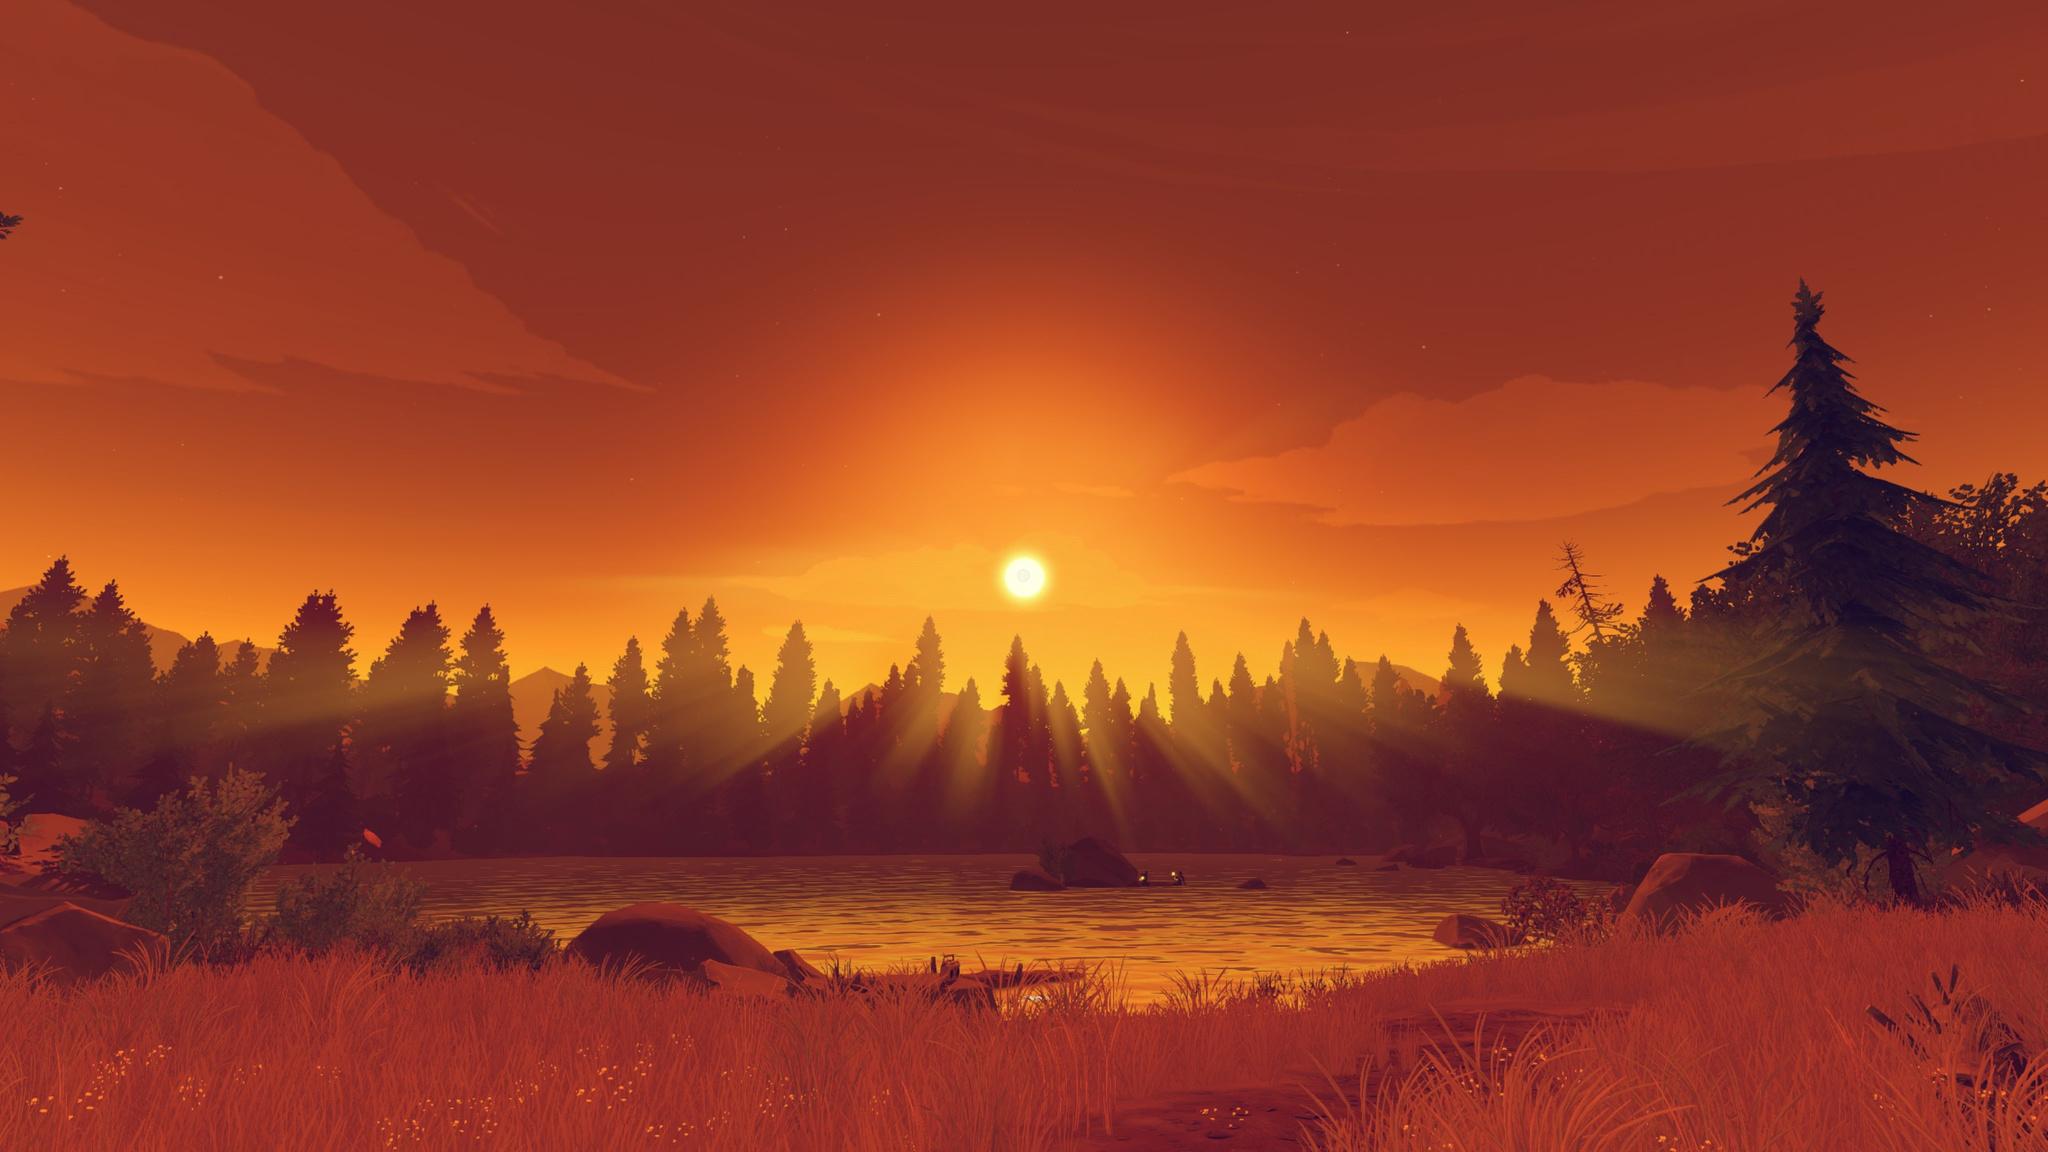 firewatch wallpaper,sky,nature,sunrise,natural landscape,red sky at morning